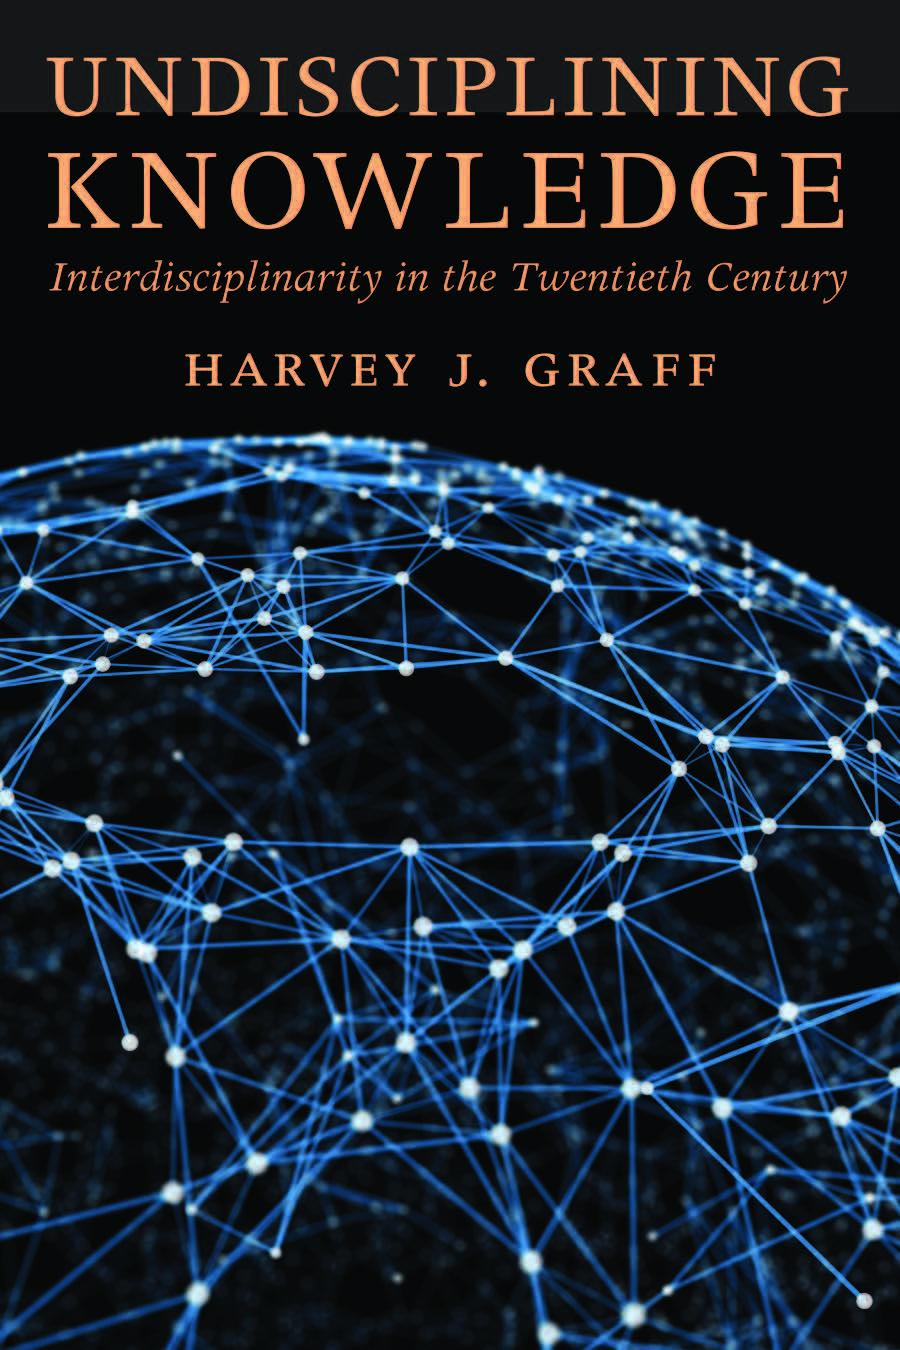 Undisciplining knowledge | JHU Press